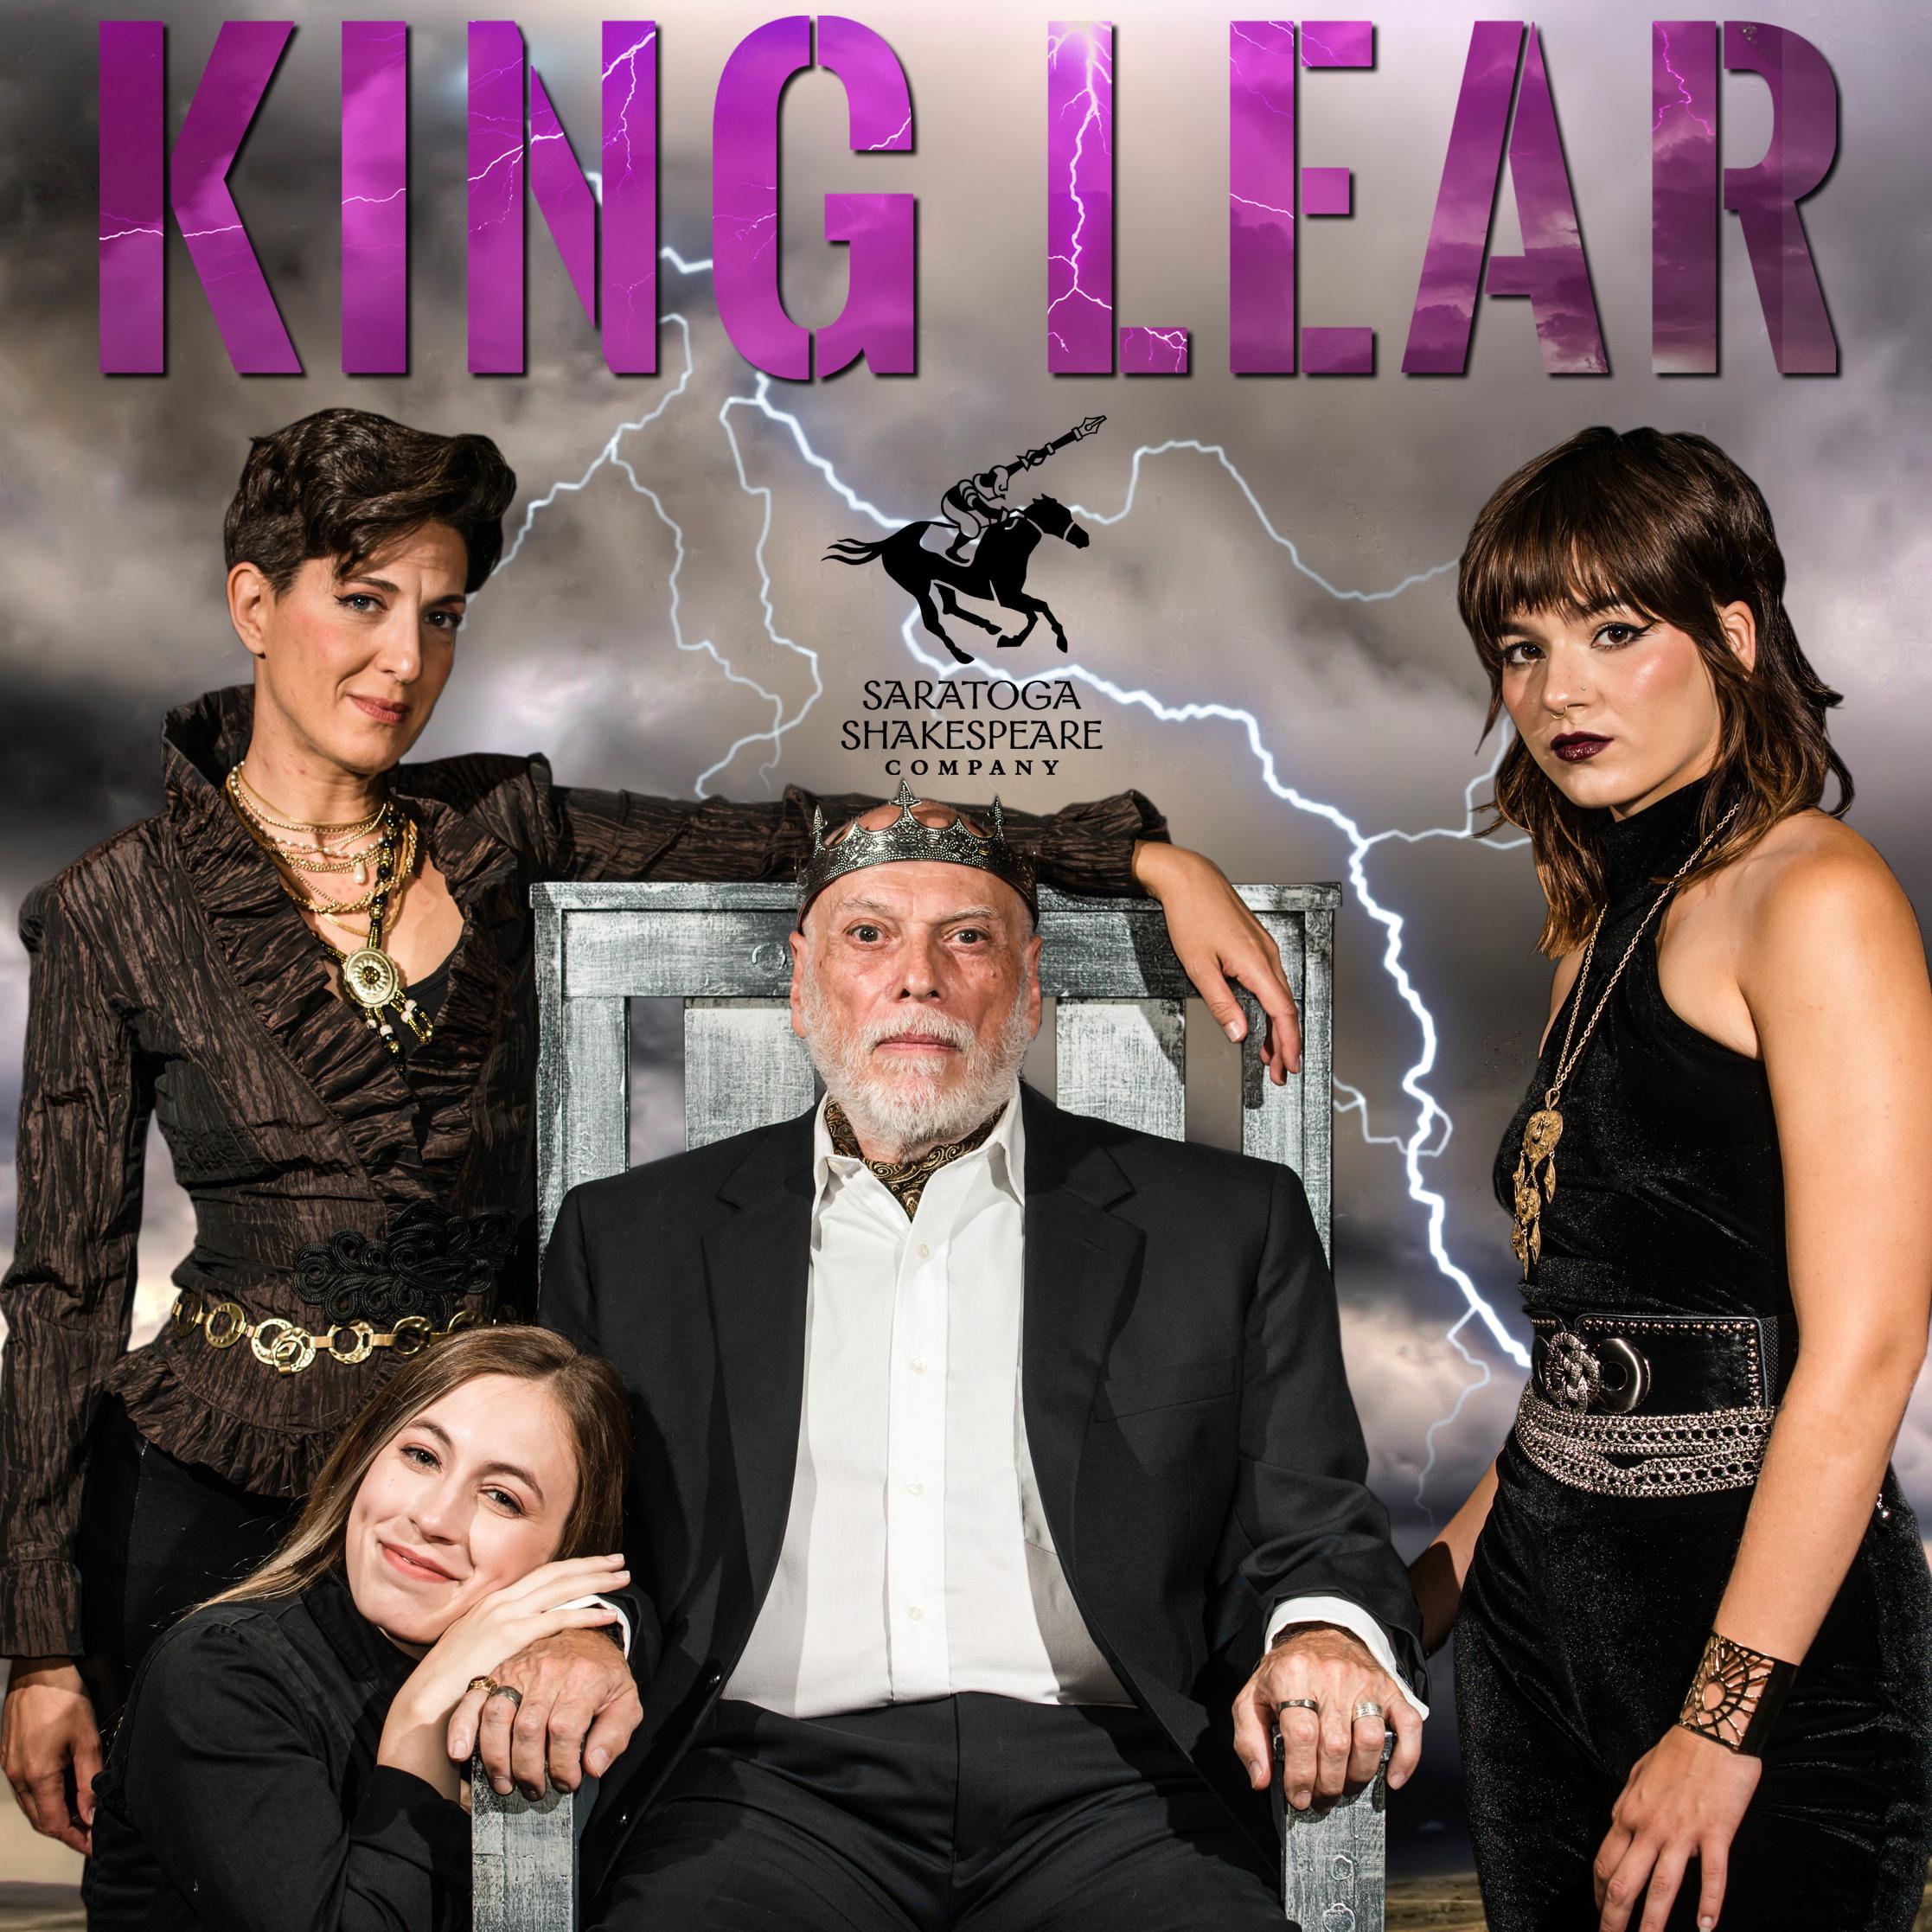 (SEATED) Lary Opitz (King Lear) (TOP L->R) Leah Walton (Goneril) and Emily Raine Blythe (Regan) (BOTTOM) Clara Hevia  Photo; Eric Jenks